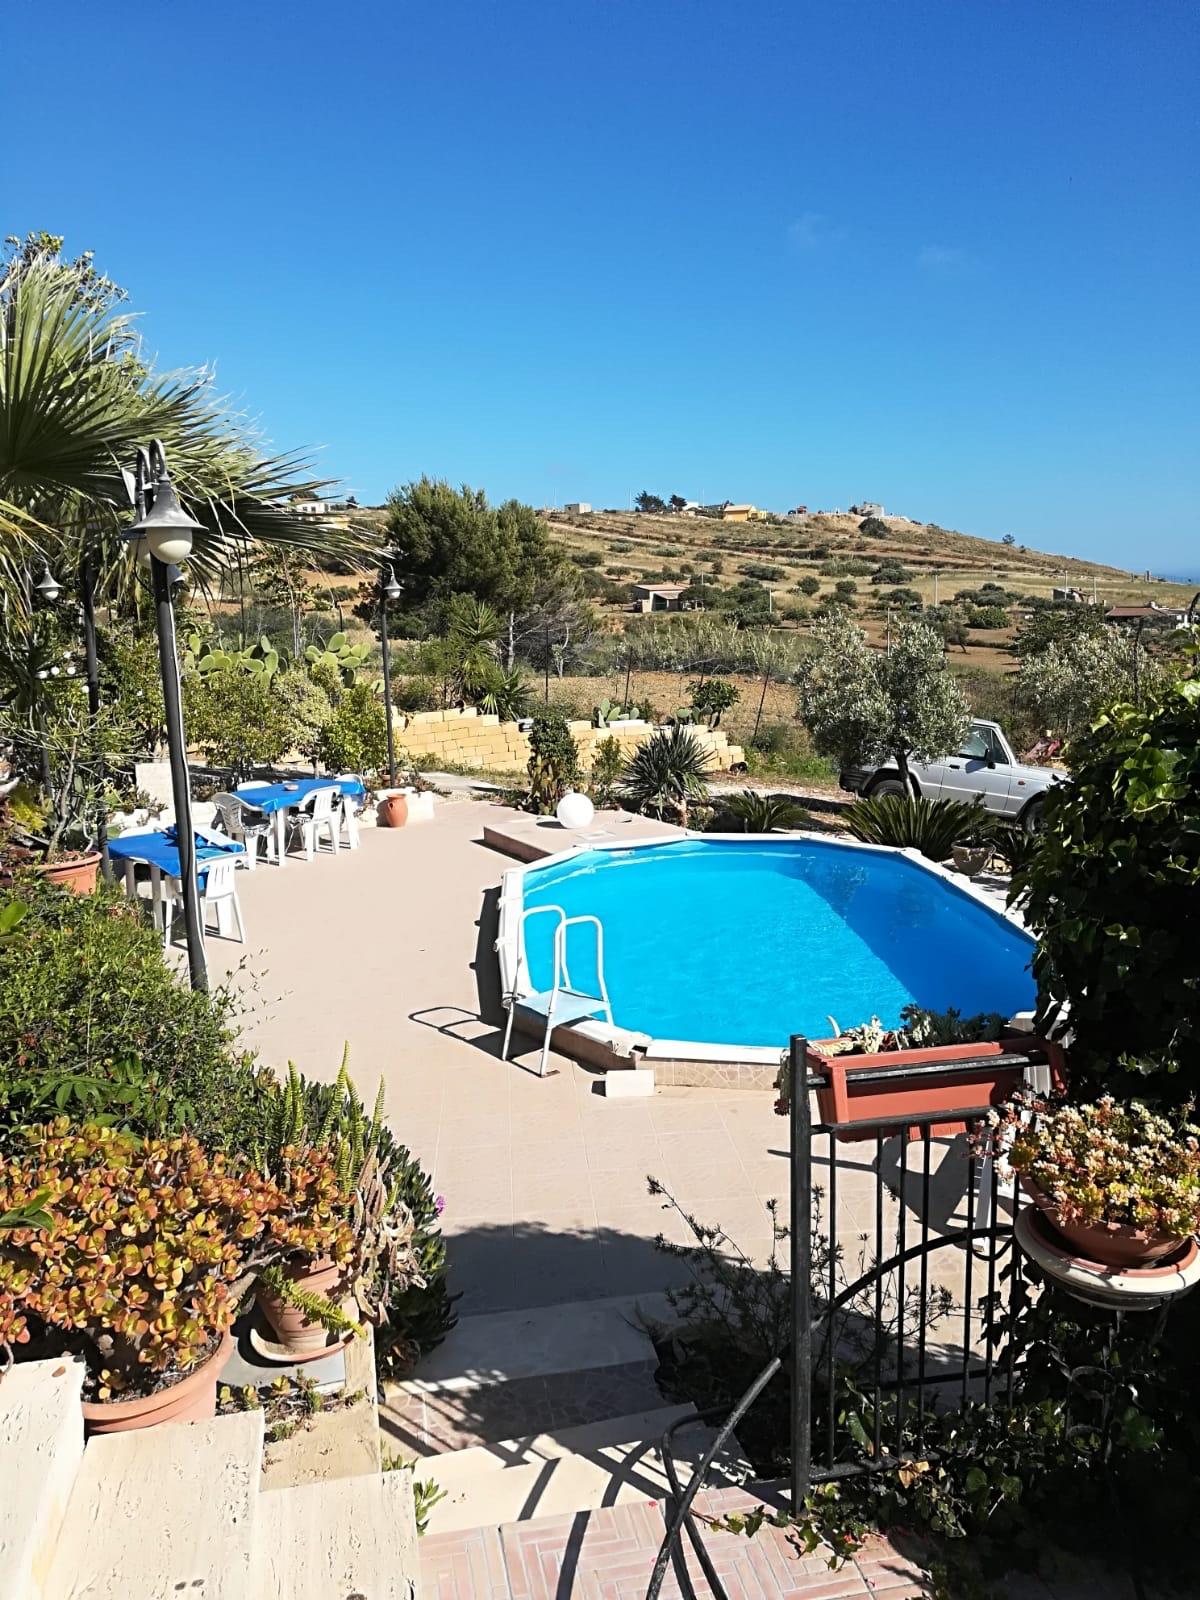 LunaChiara   Apartments for Rent in Realmonte, Sicilia, Italy